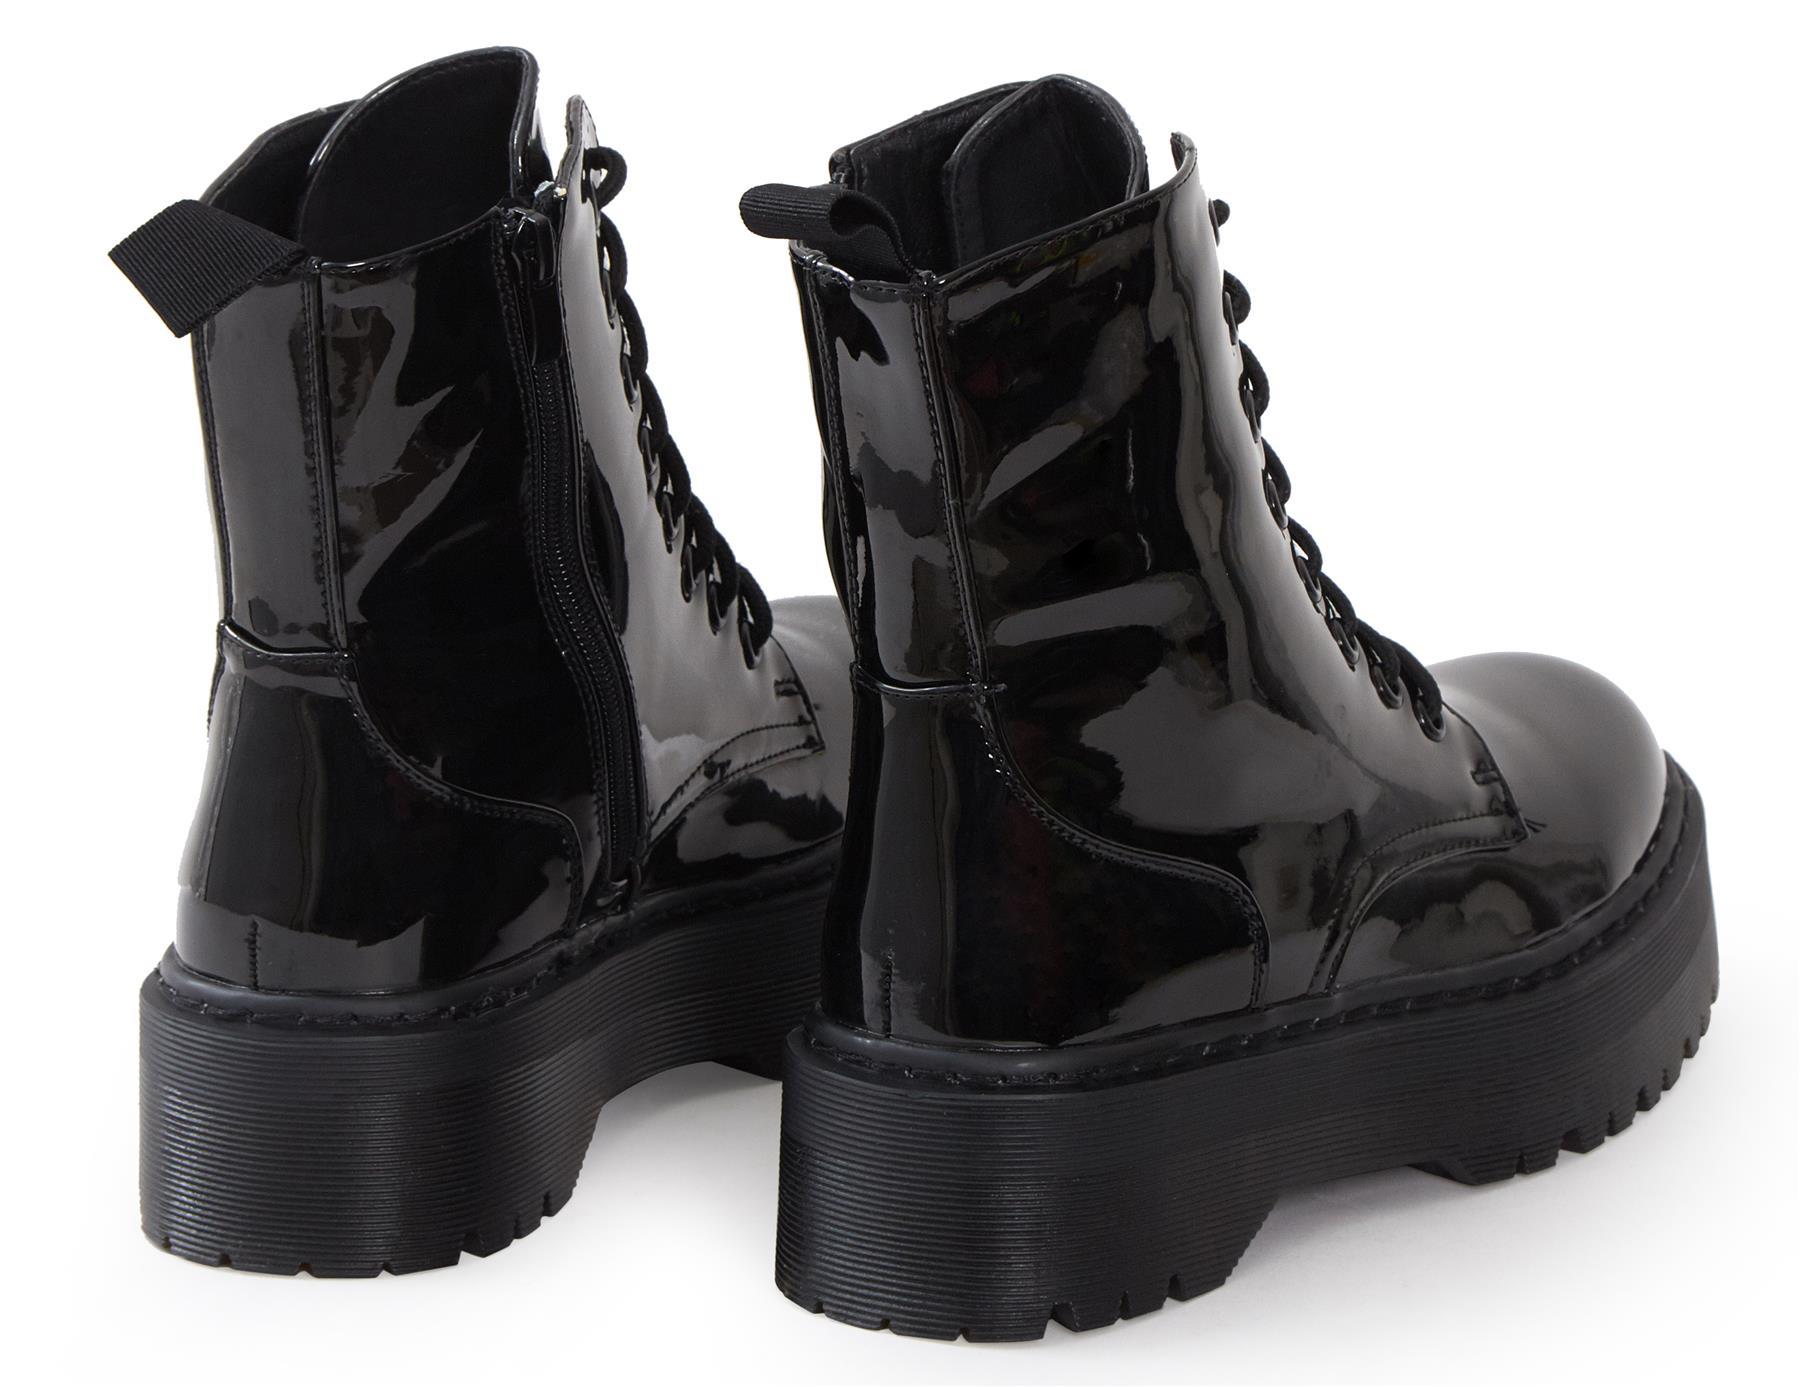 Womens-HiTop-Platform-Military-Punk-Biker-Ankle-PU-Leather-Lace-Up-Vintage-Boots thumbnail 6